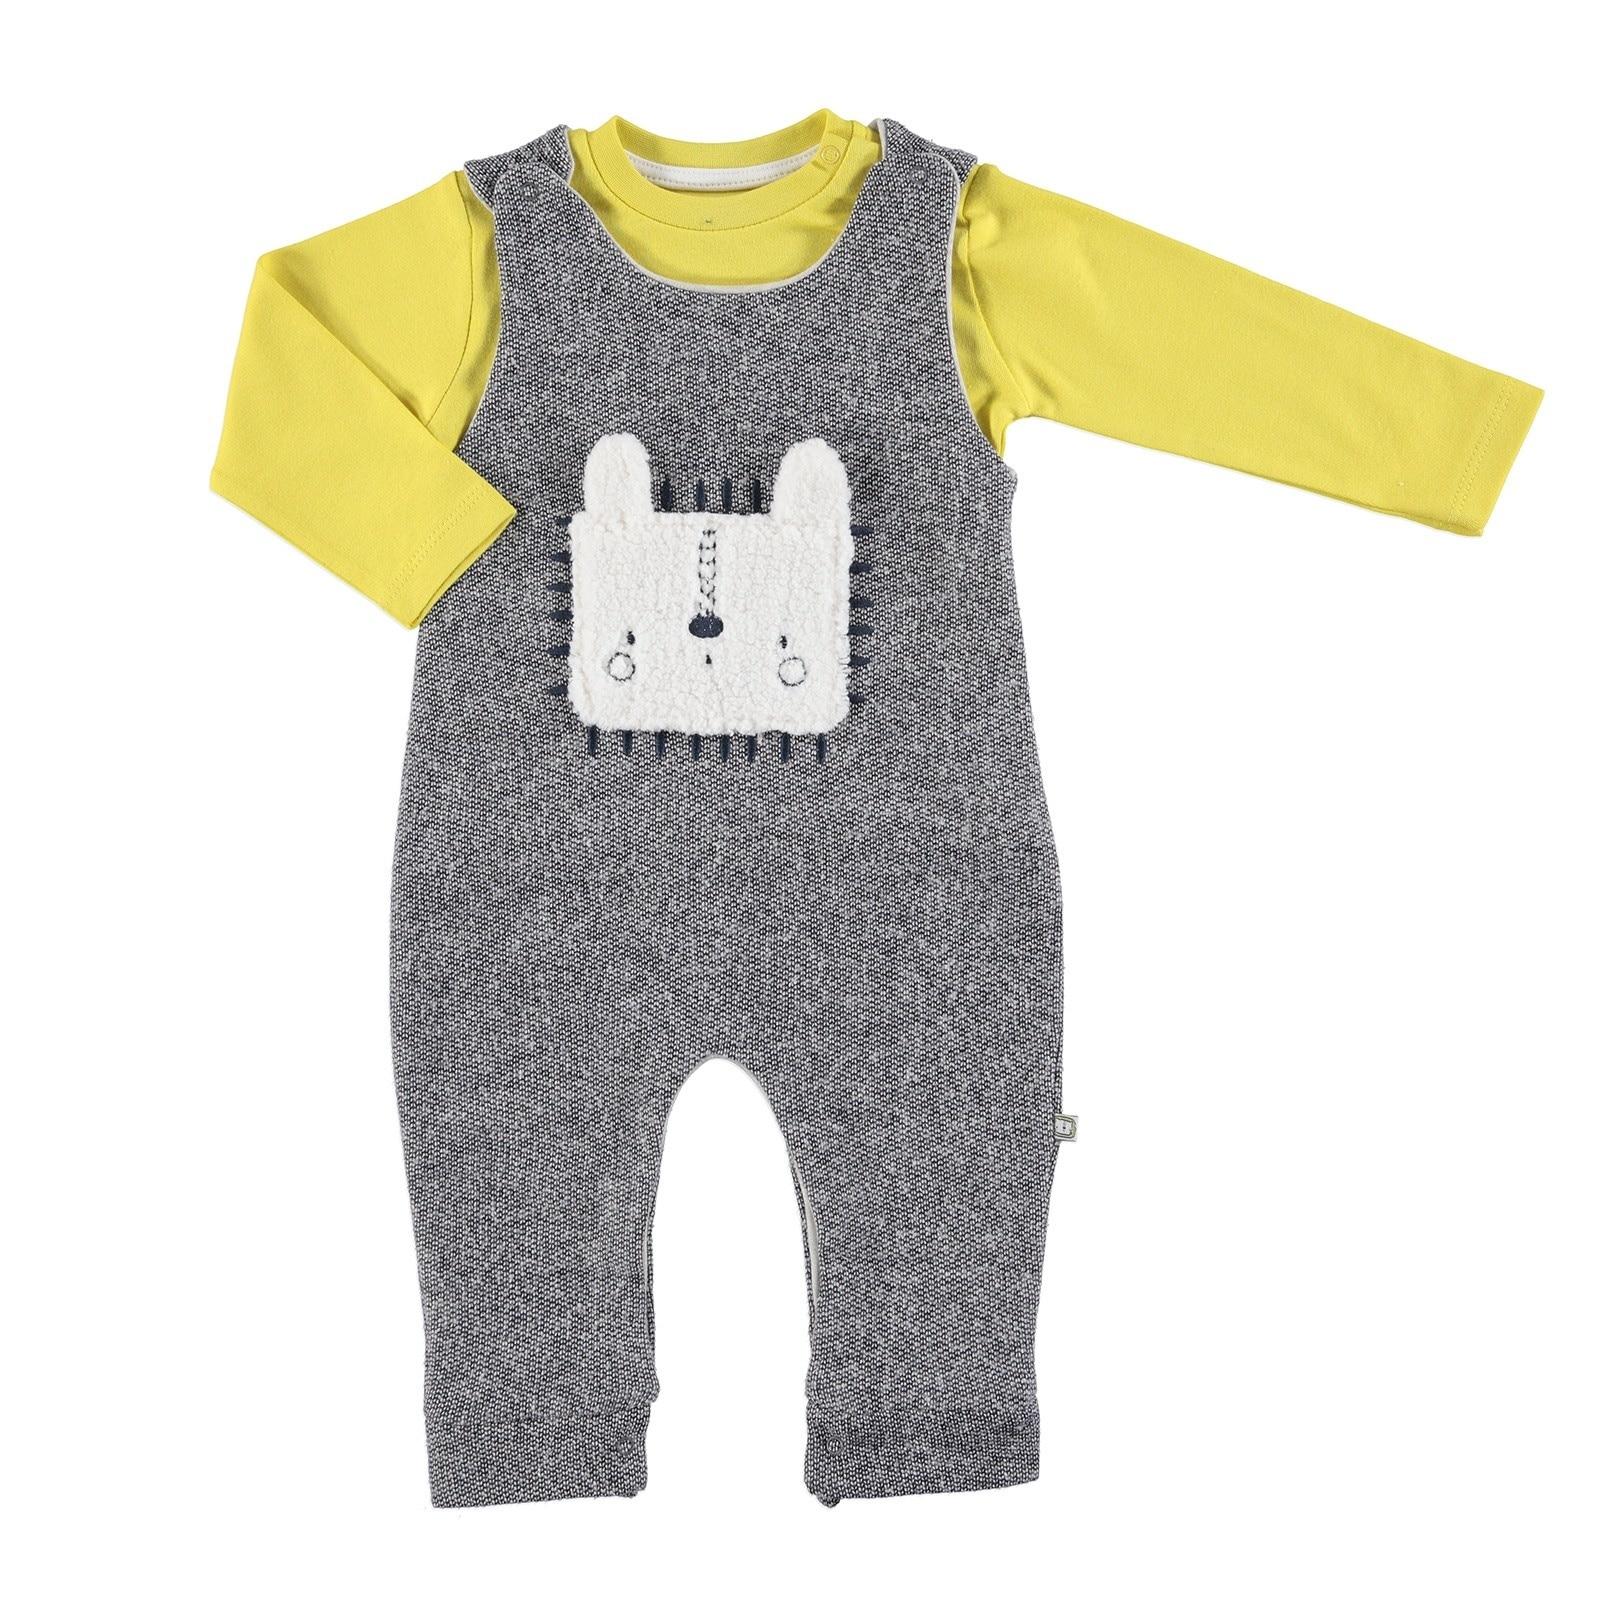 Ebebek Mymio Lion Baby Dungarees Sweatshirt Set 2 Pcs